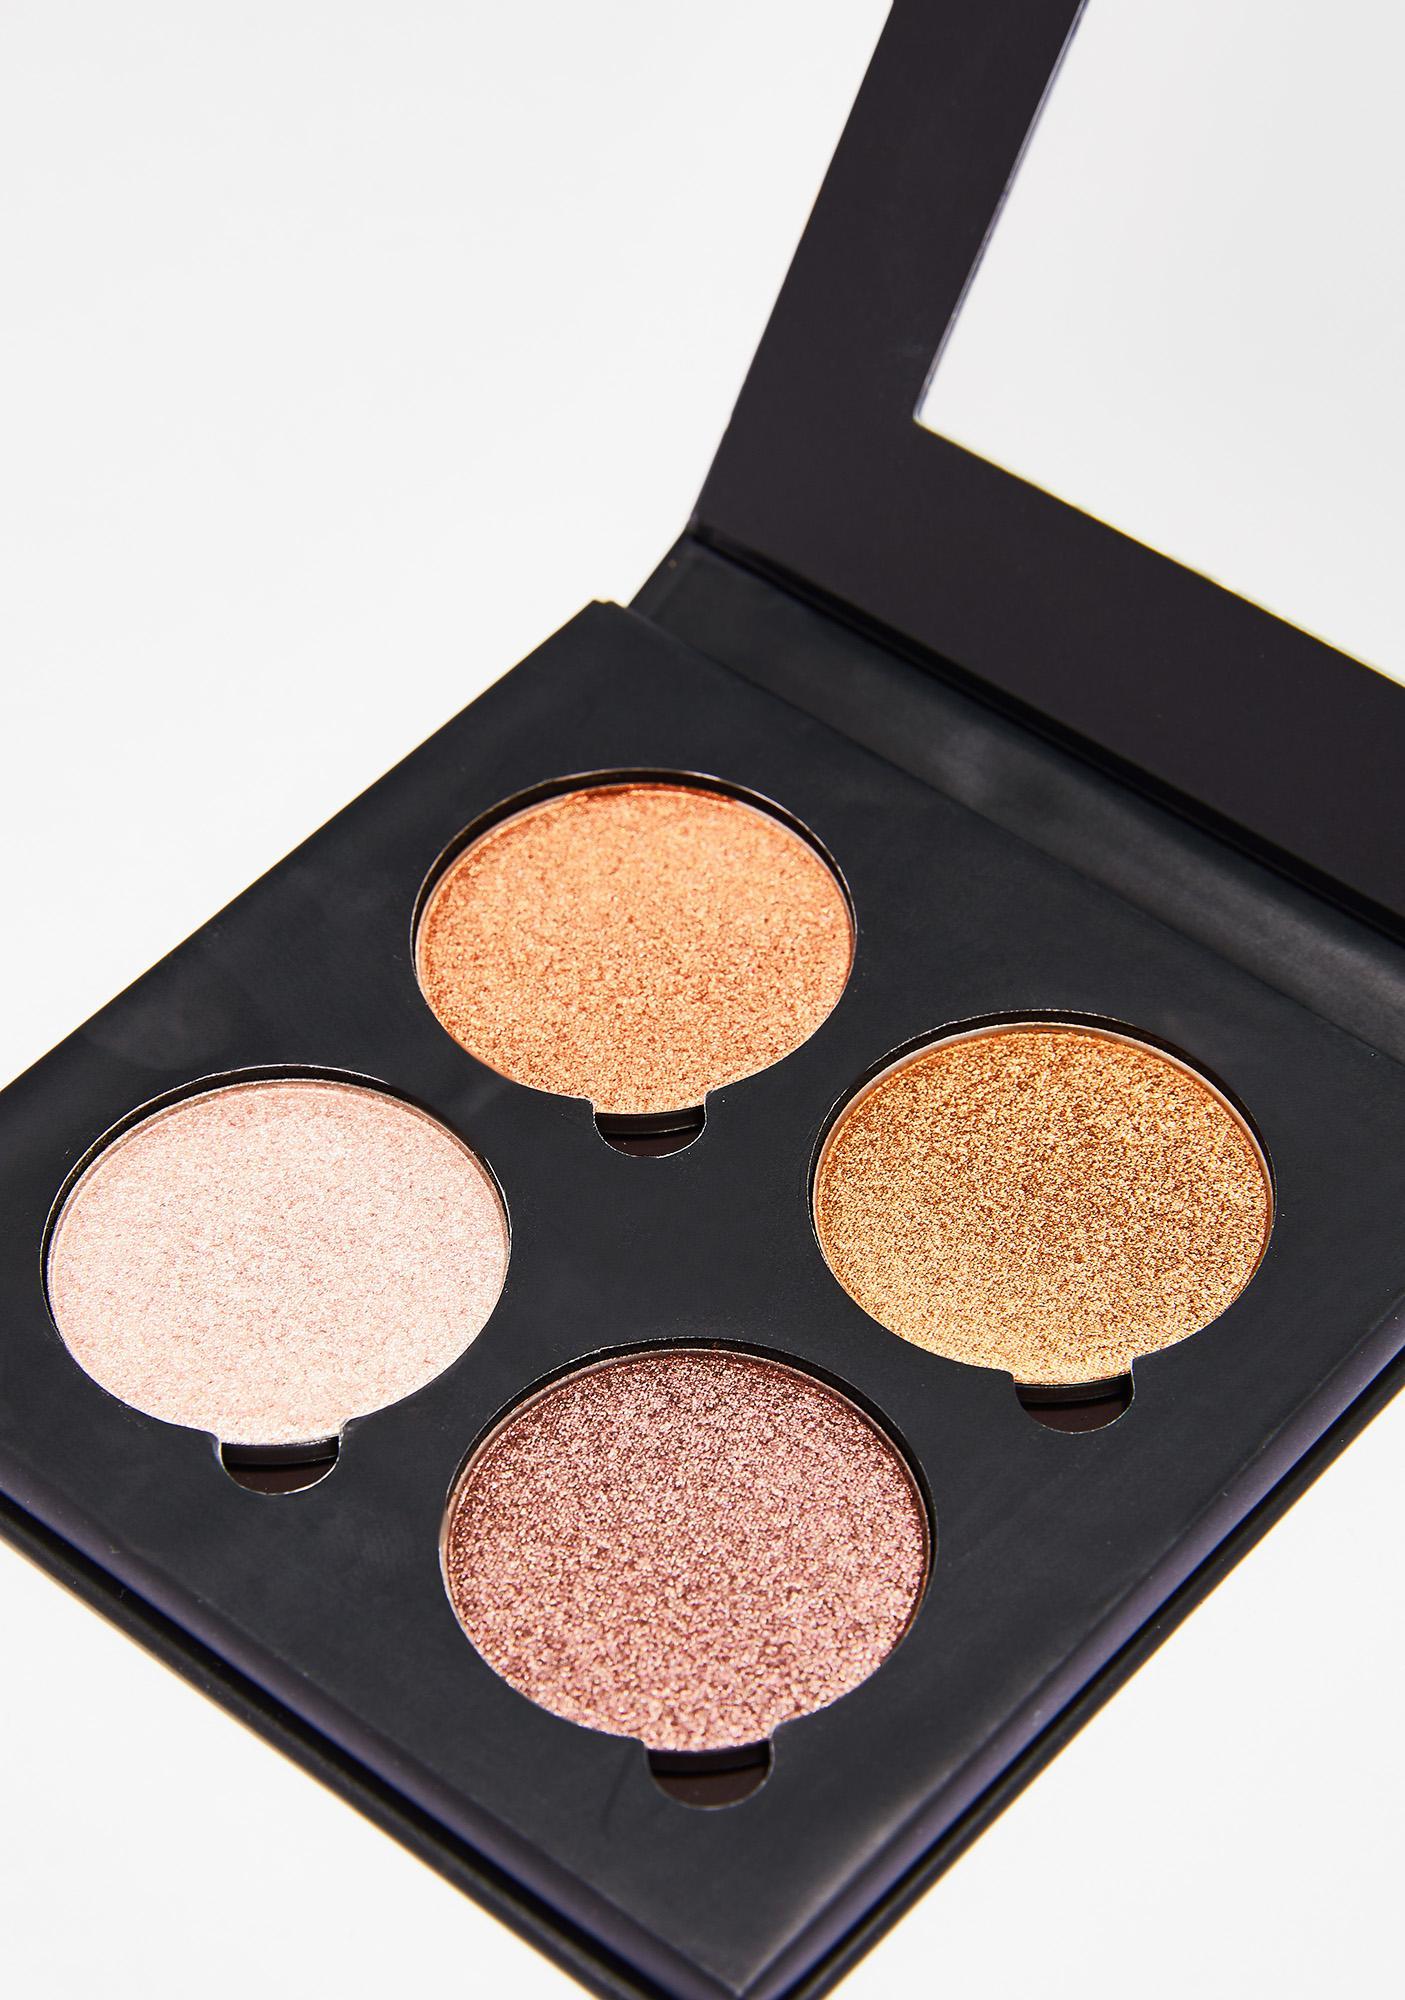 SUVA Beauty The Hussle Eyeshadow Palette